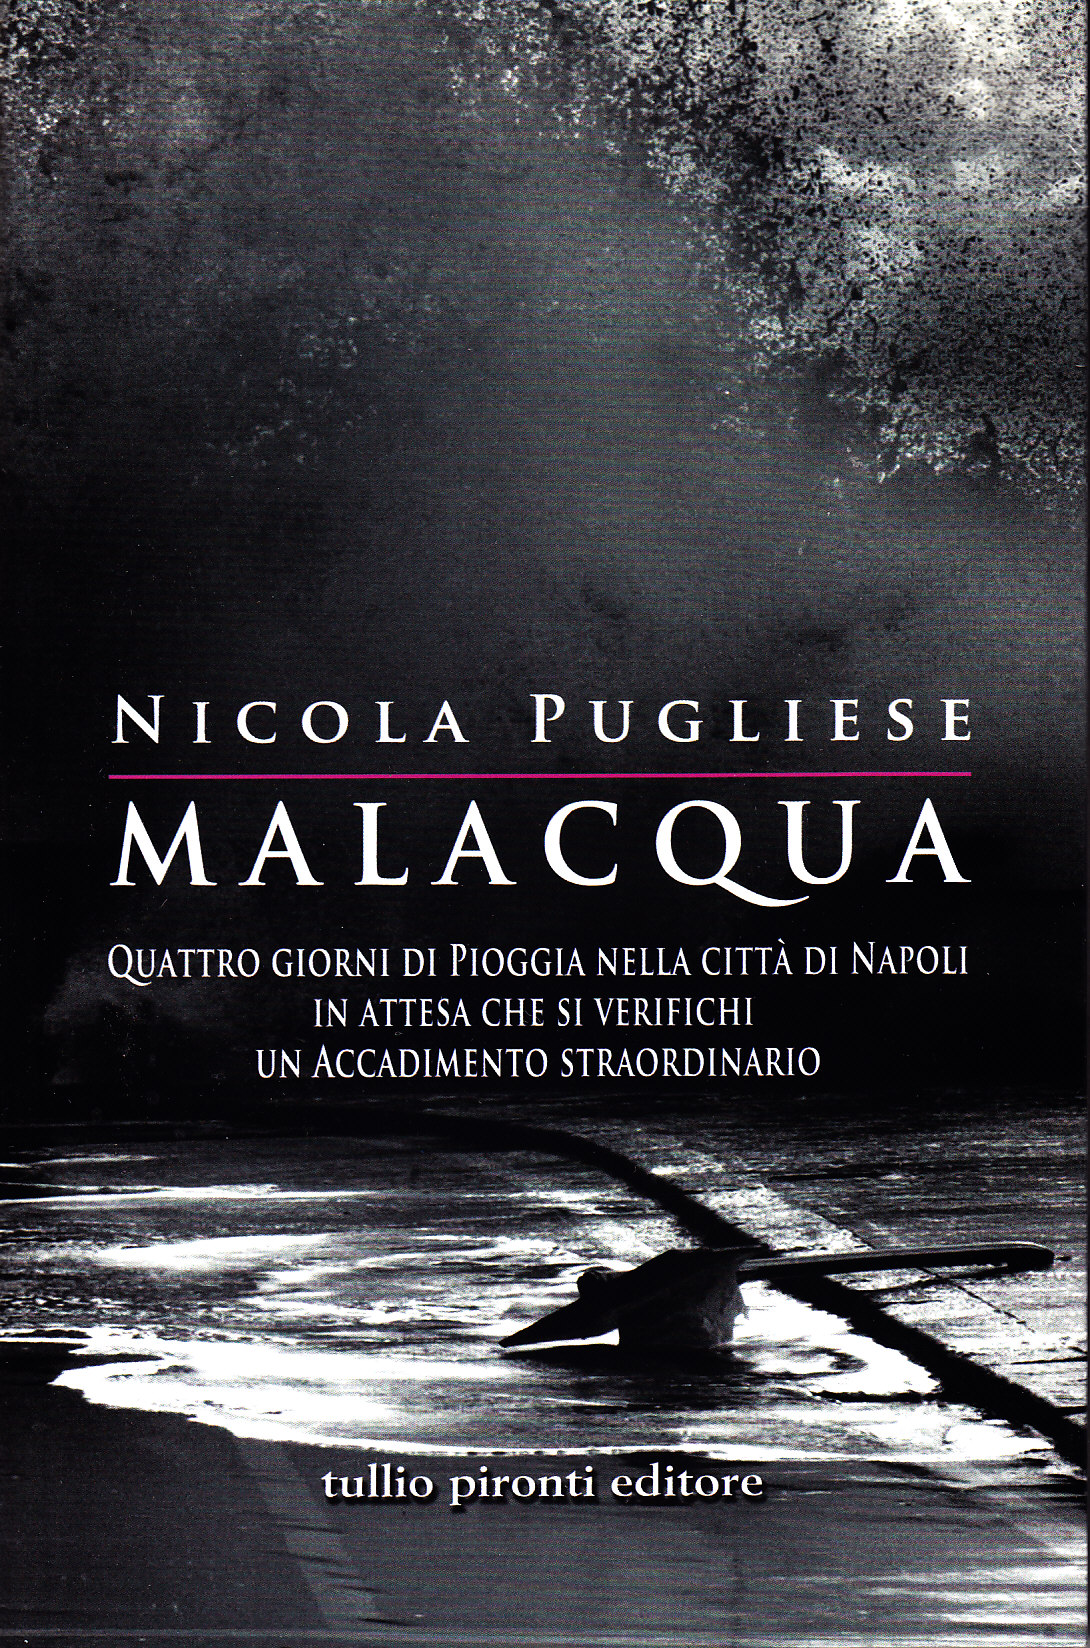 Malacqua